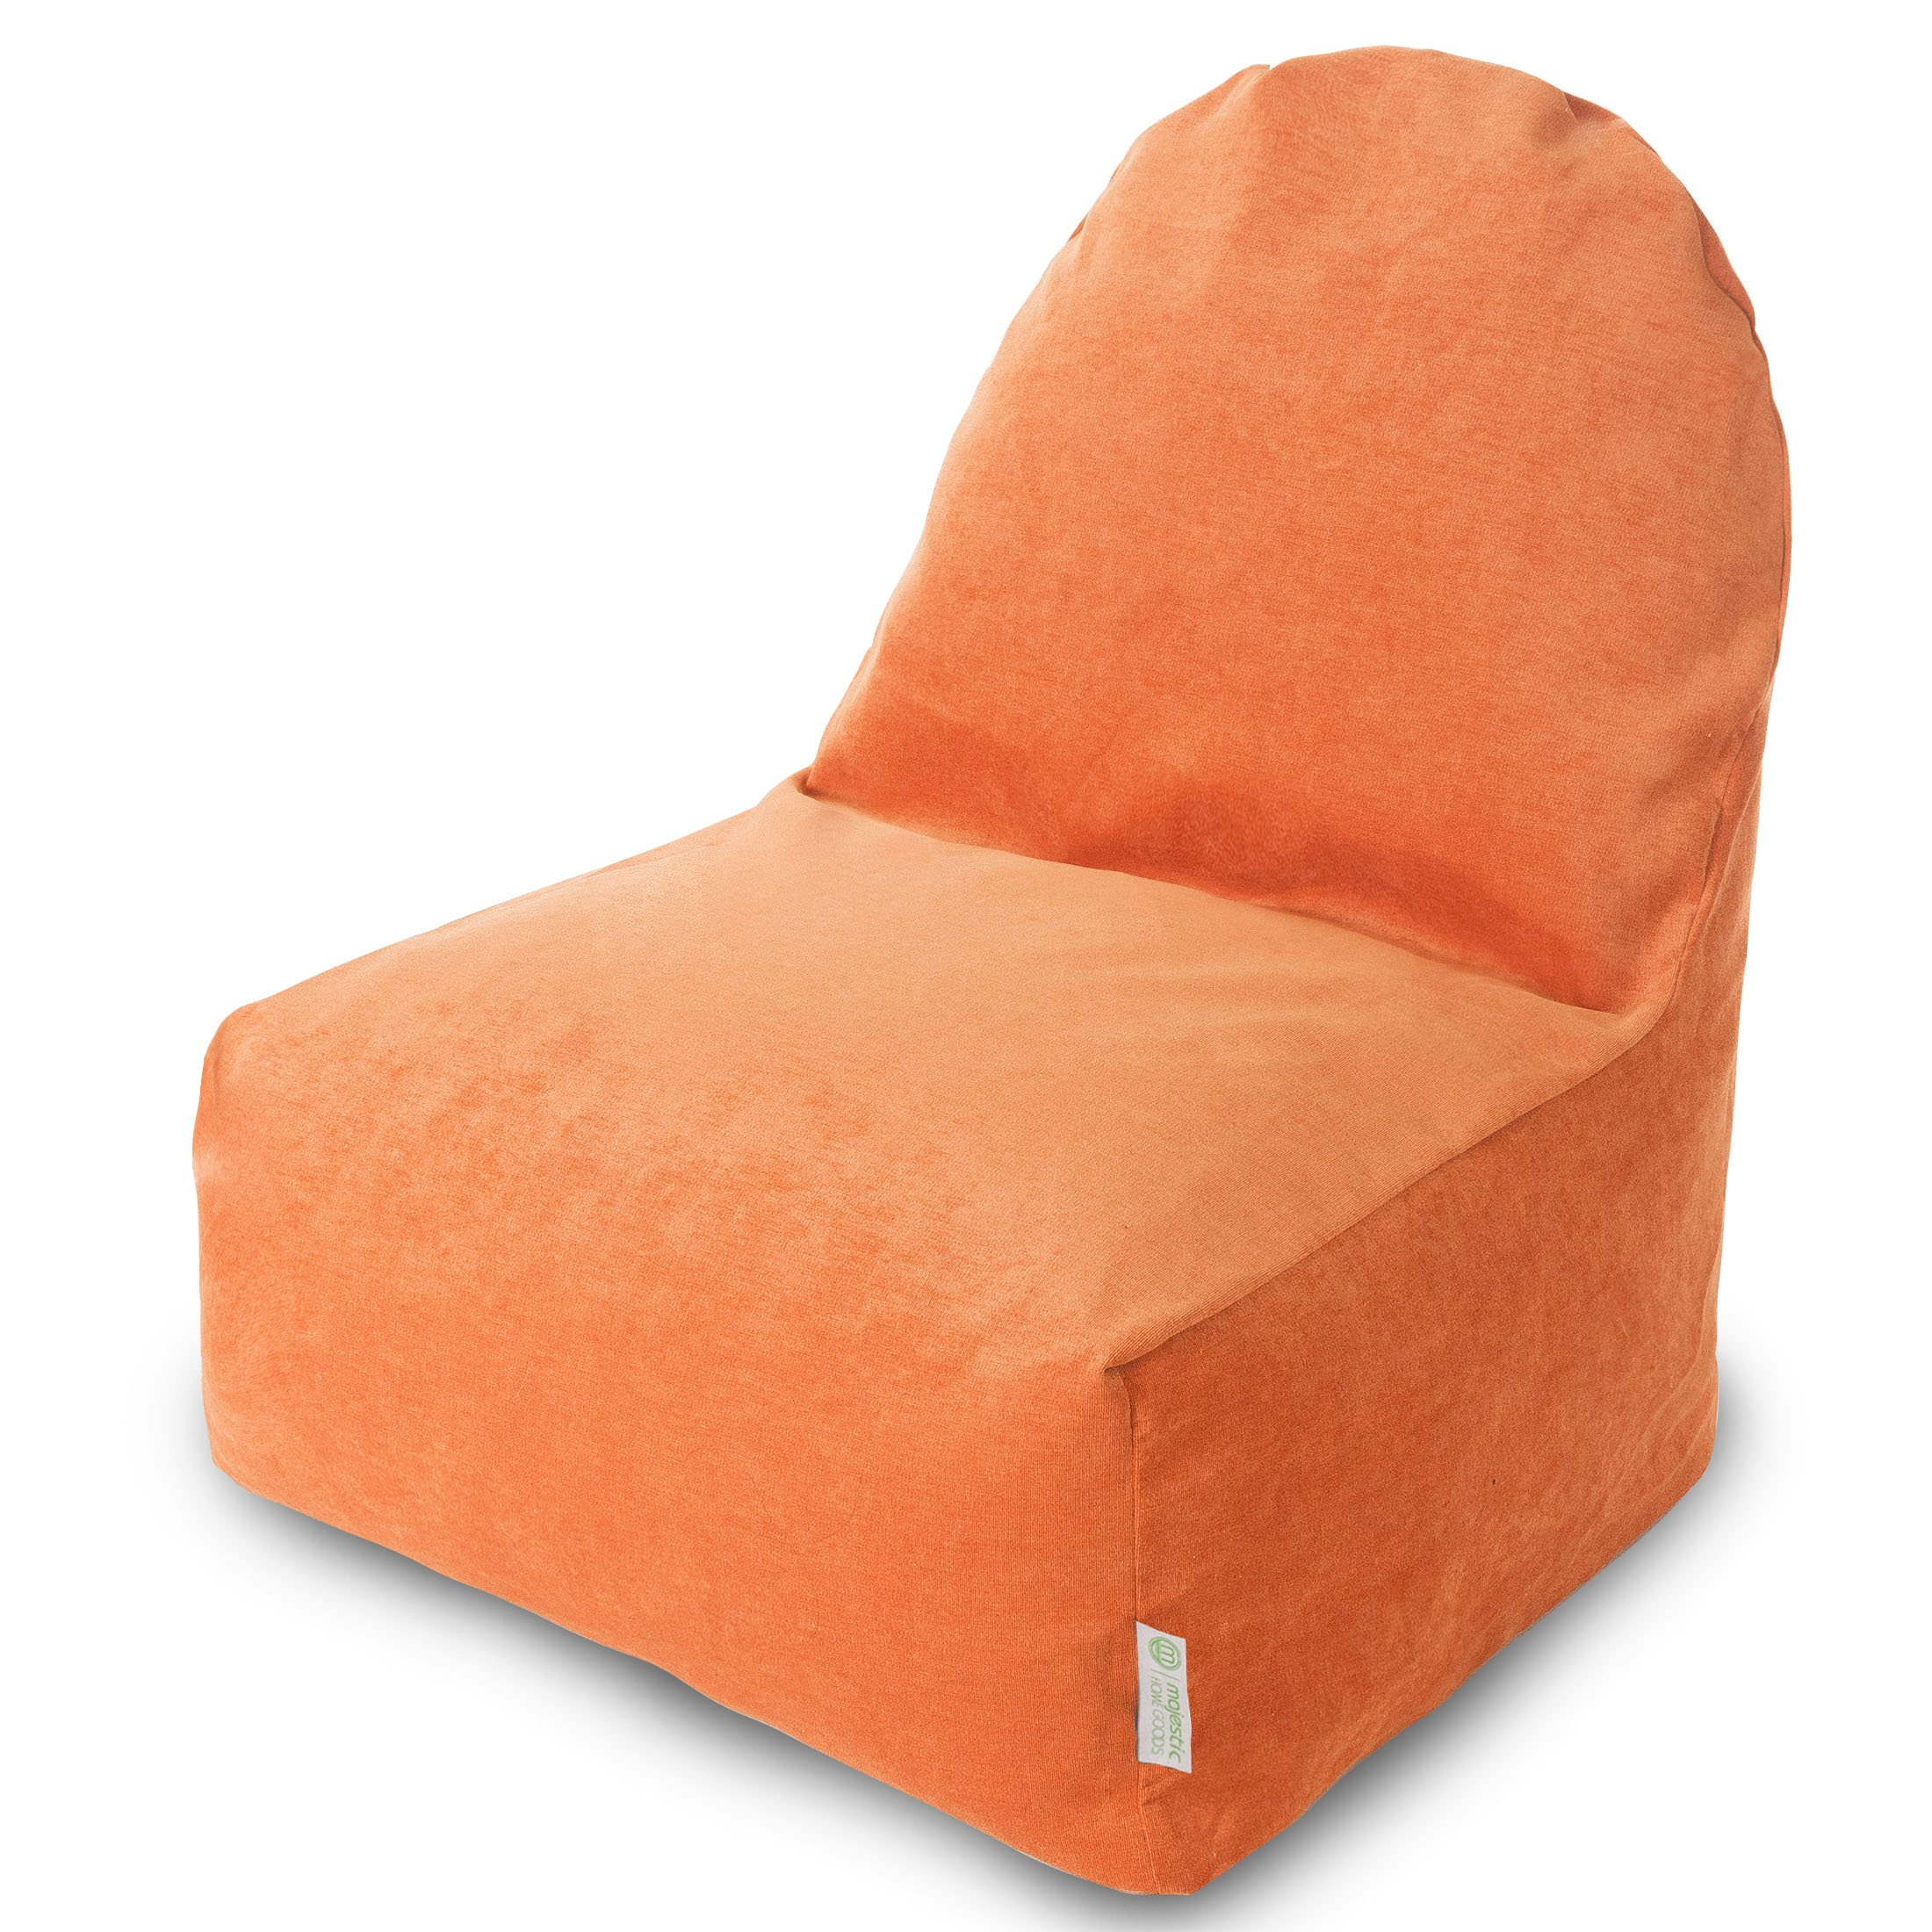 Majestic Home Goods Kick-It Chair, Villa Orange